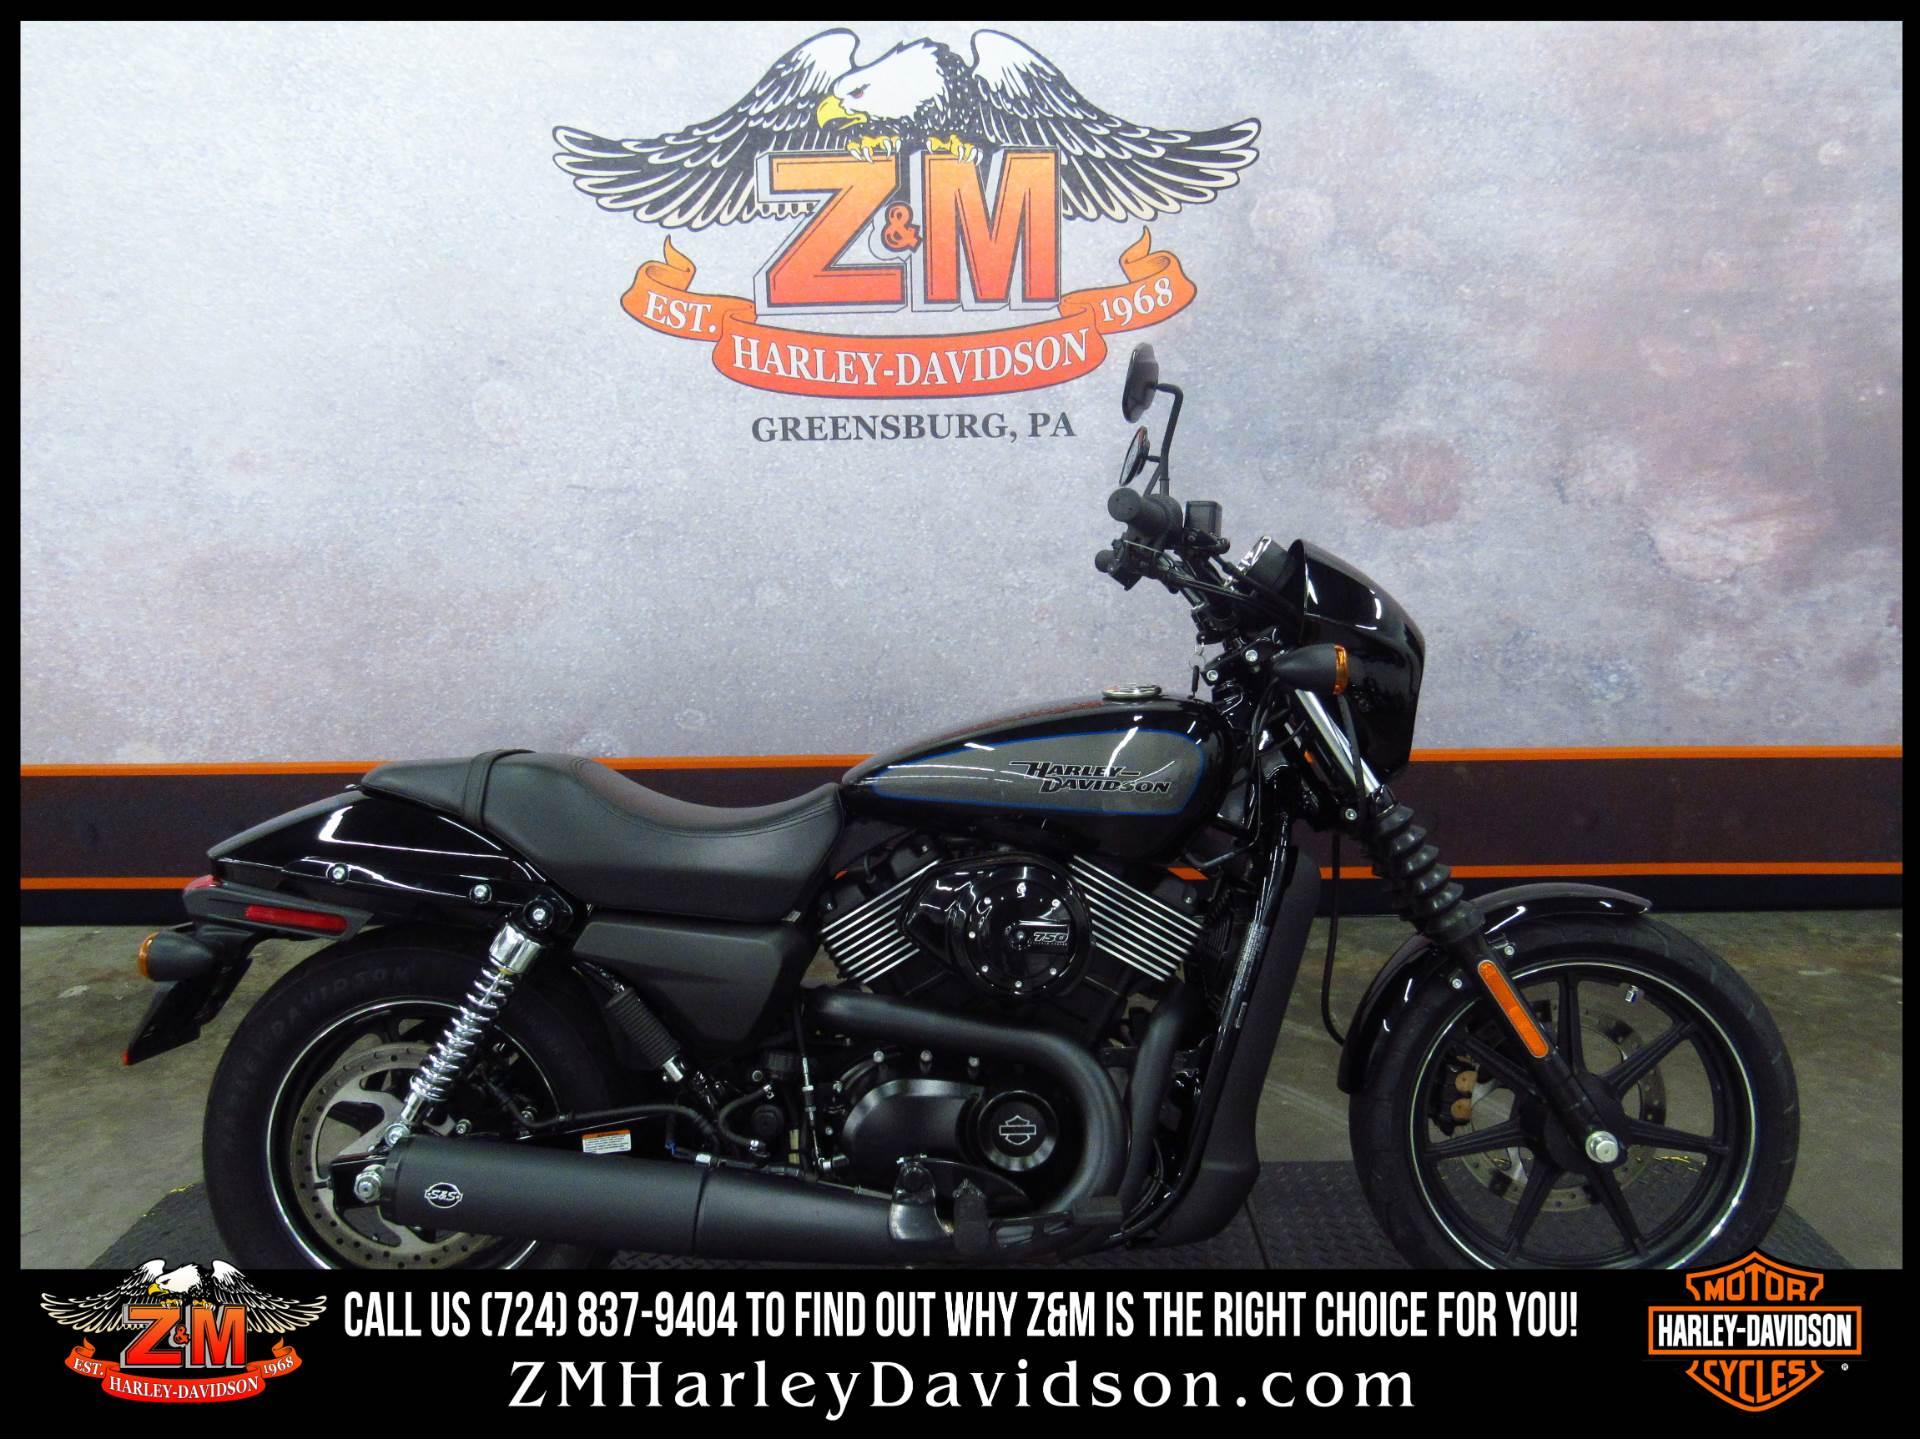 2017 Harley Davidson Street 750 In Greensburg Pennsylvania Photo 1